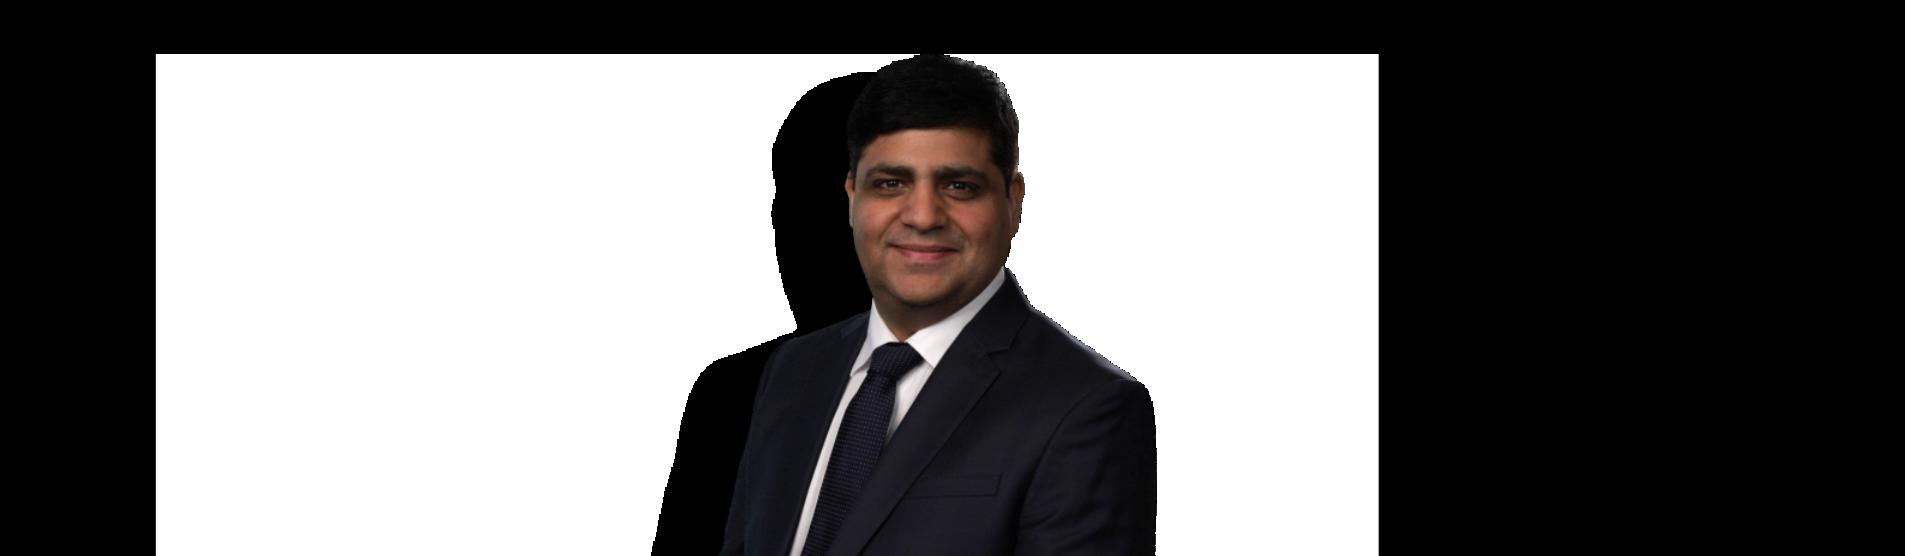 Headshot of Arshid A. Sheikh